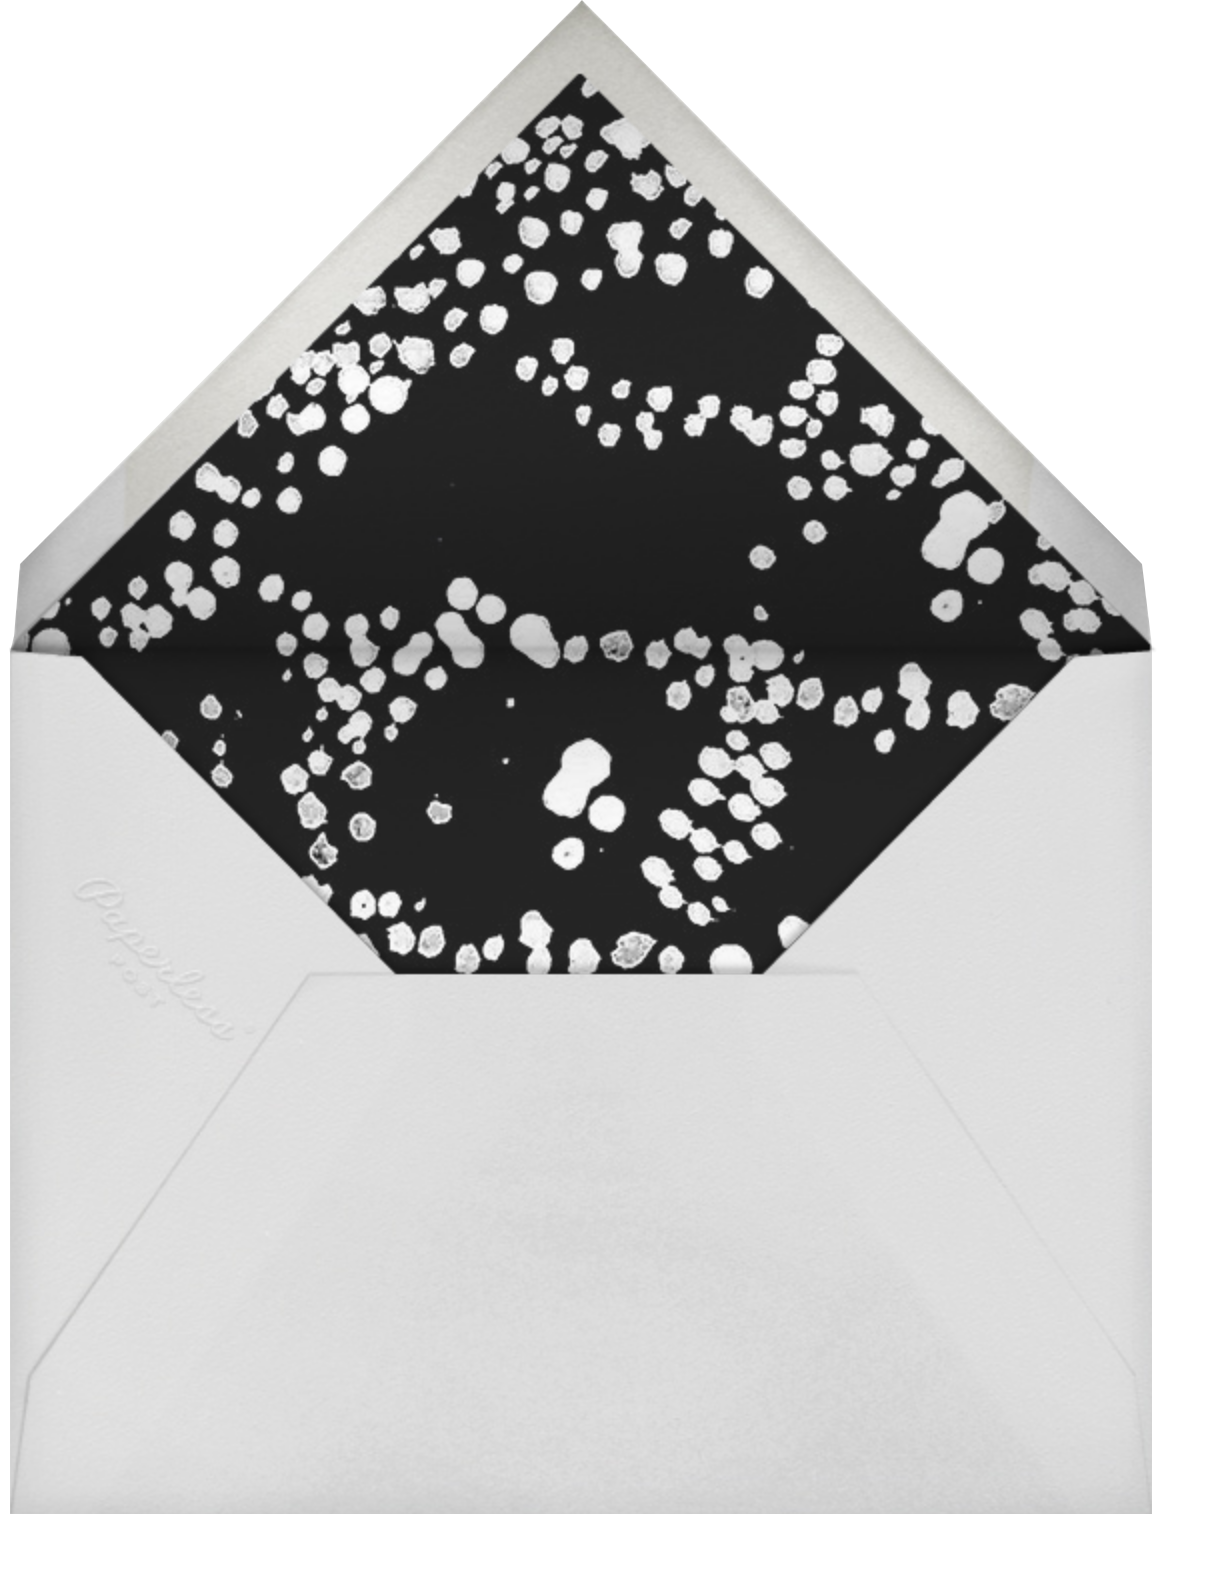 Evoke (Tall) - Black/Silver - Kelly Wearstler - Cocktail party - envelope back